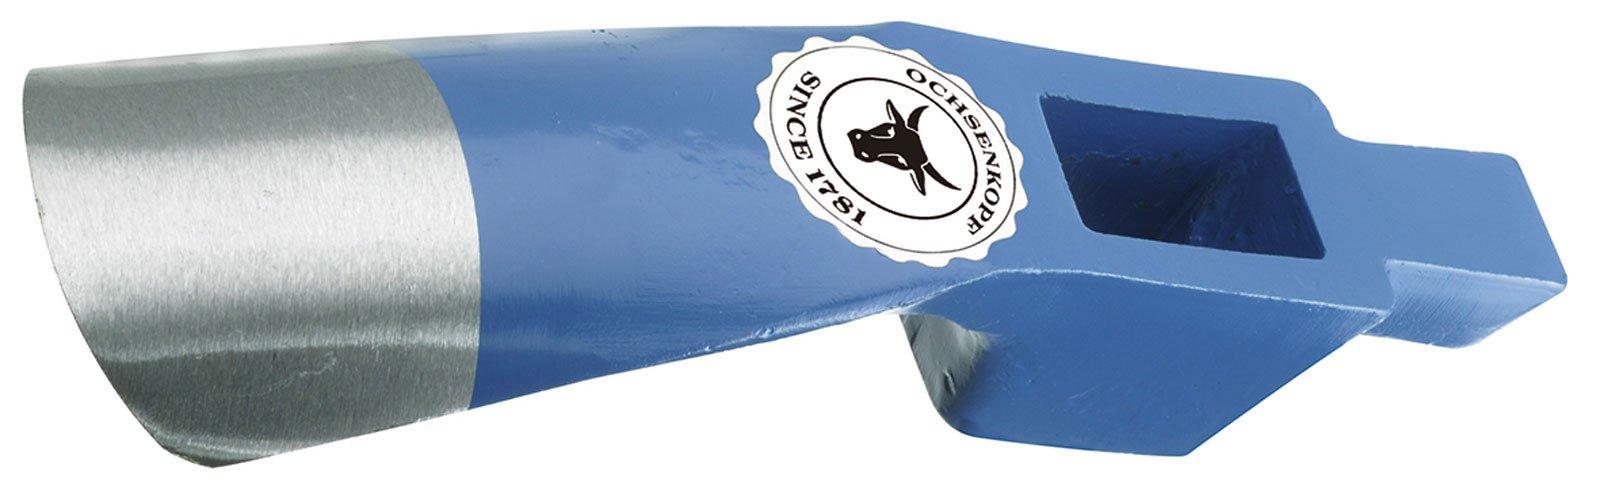 Ochsenkopf Curved Adze, 70mm (2.8'') Blade